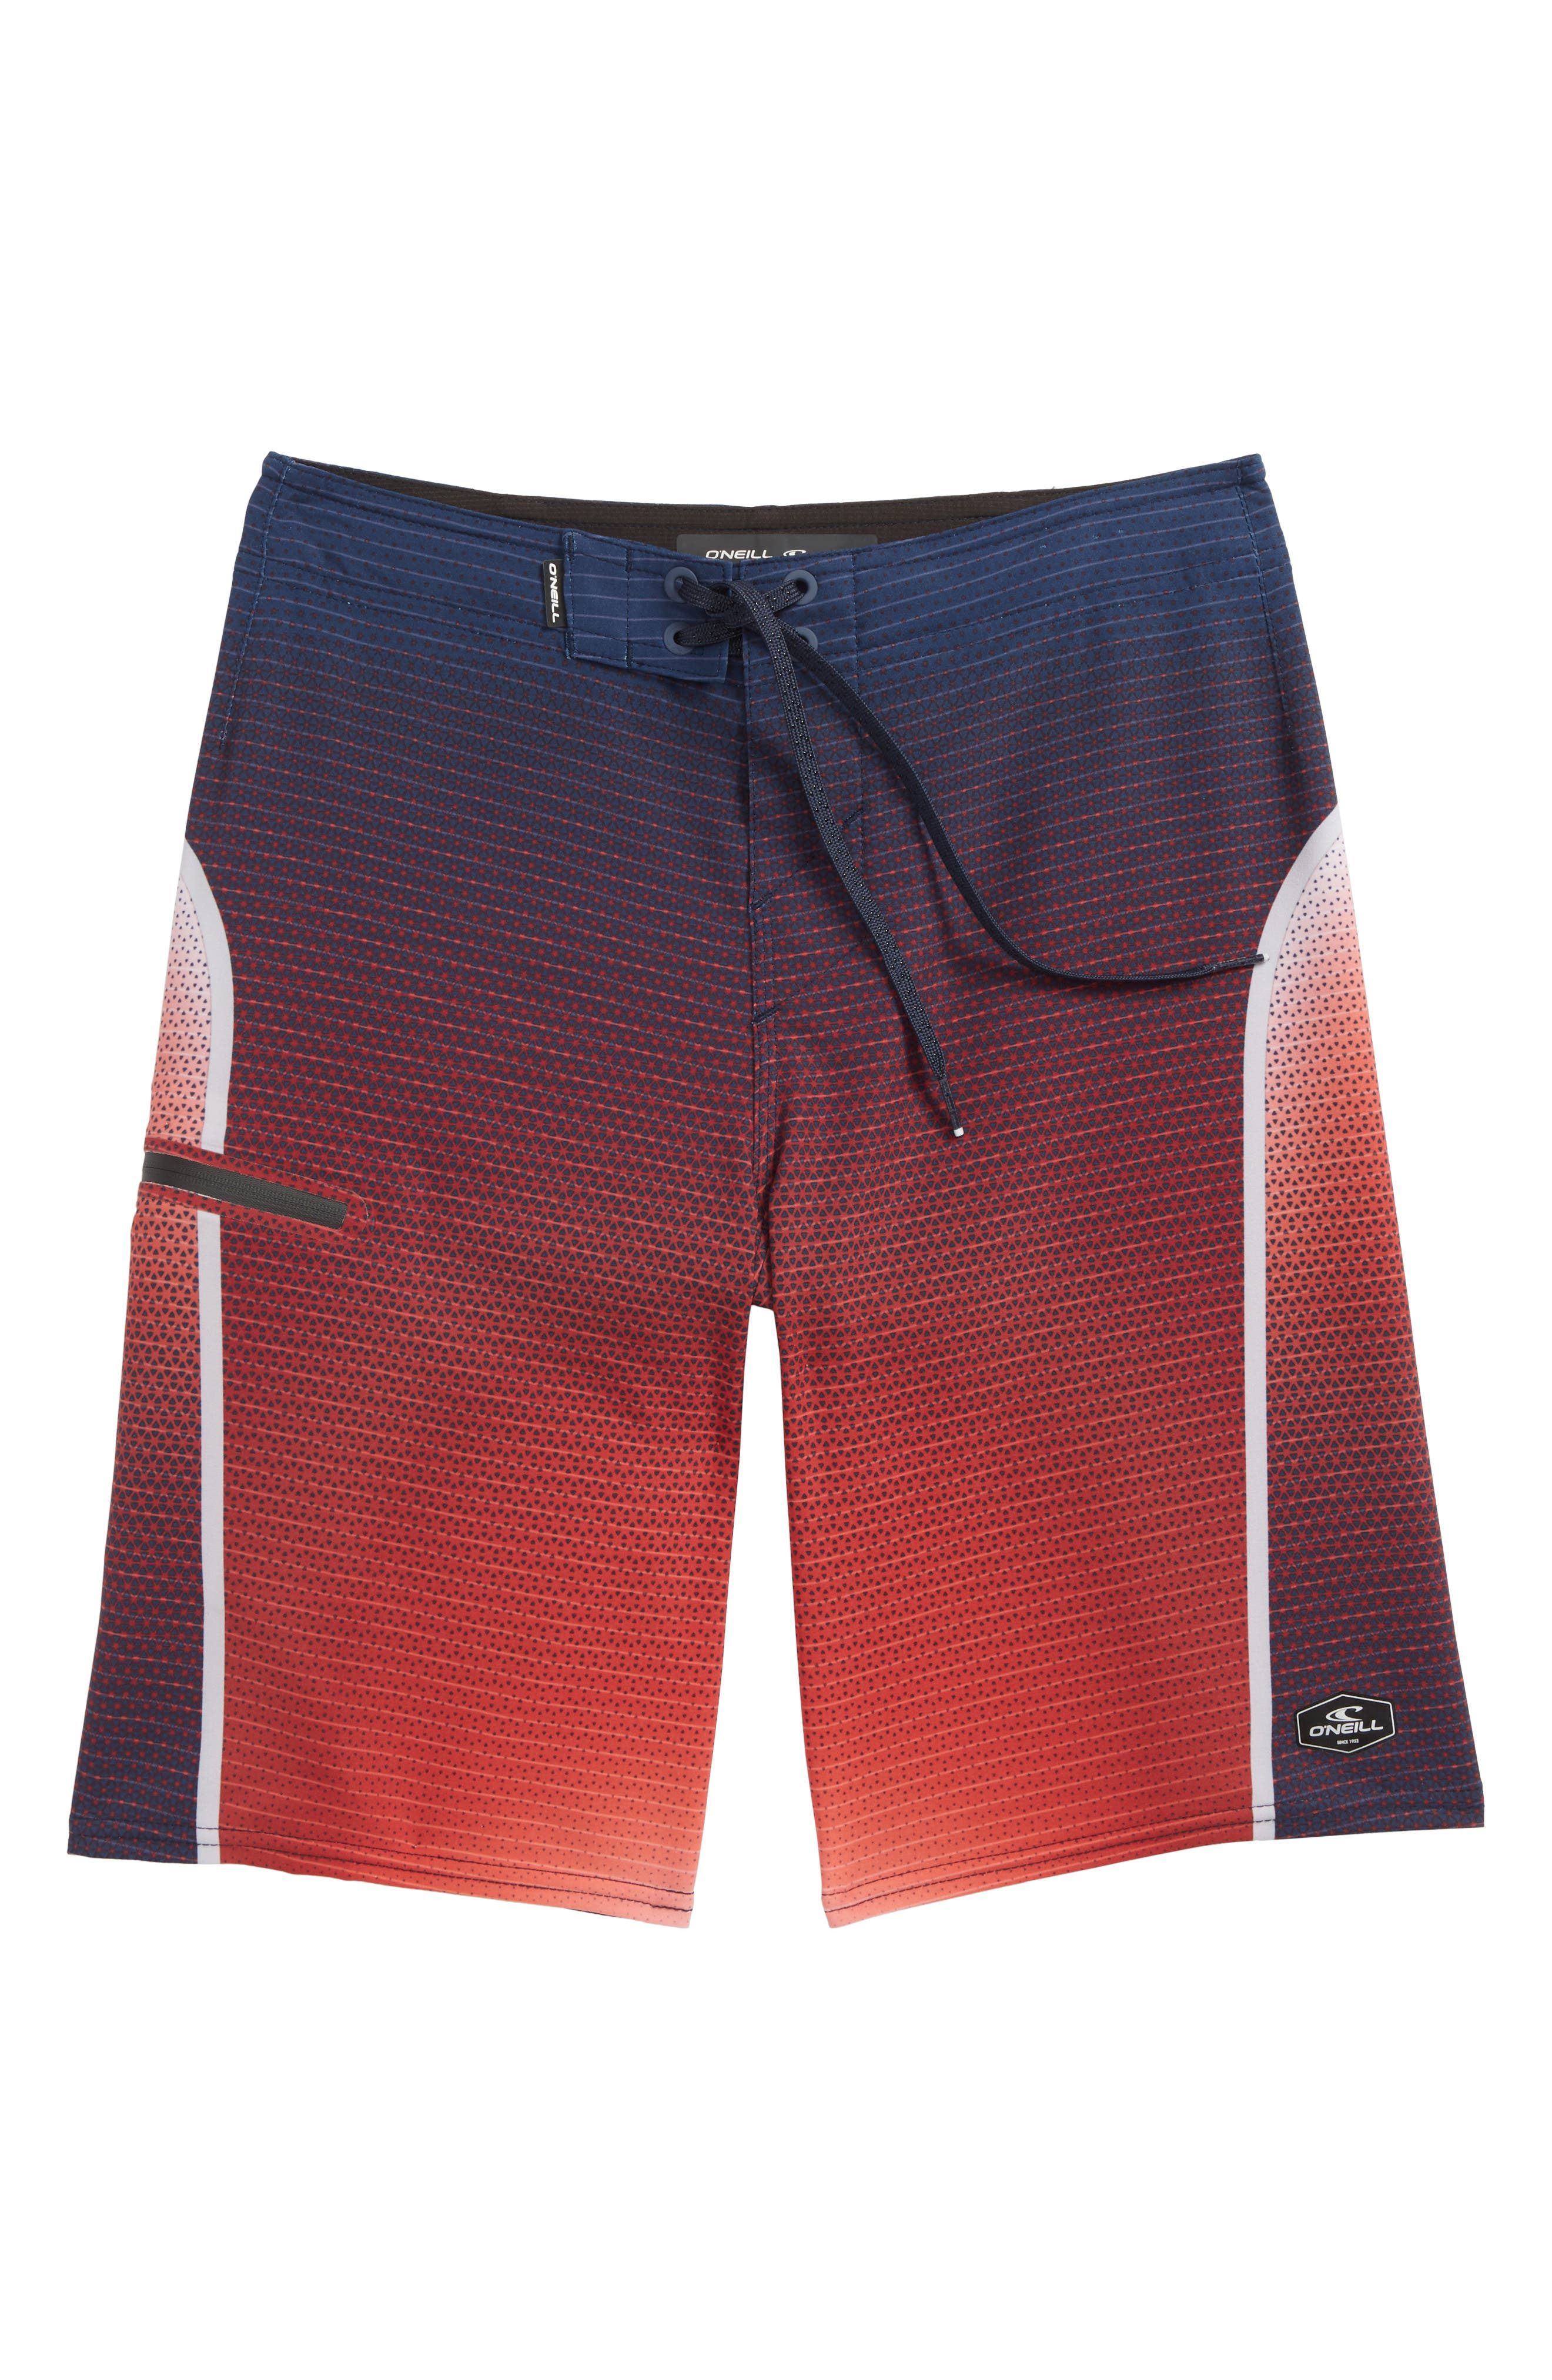 Hyperfreak Prizma Board Shorts,                         Main,                         color, 600